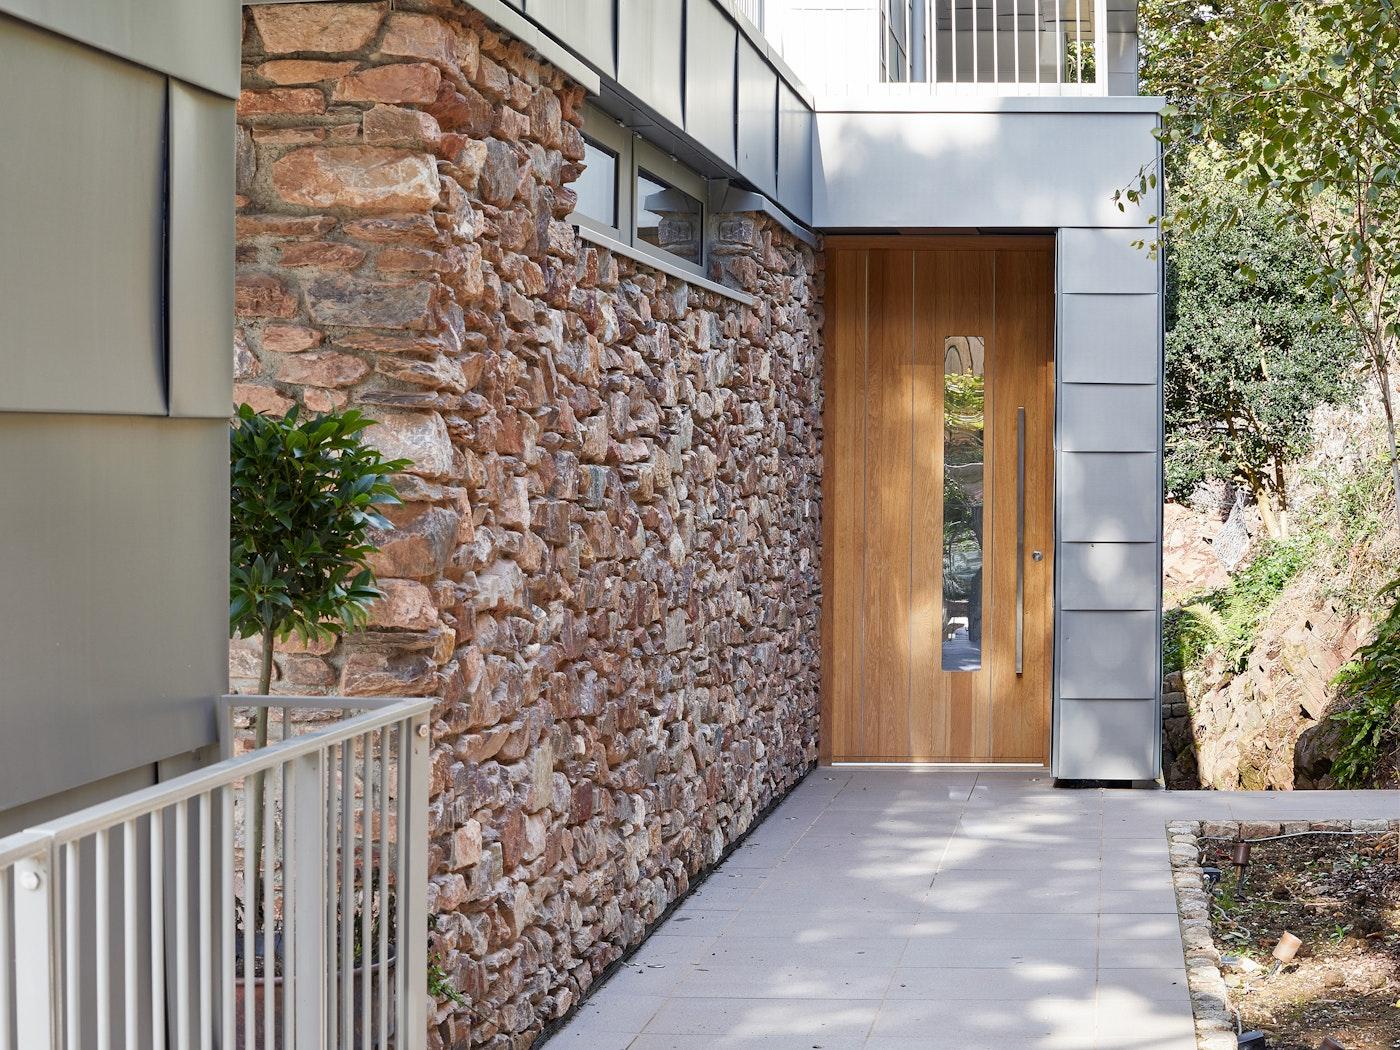 The Urban Front europan oak front door is framed by stone & zinc